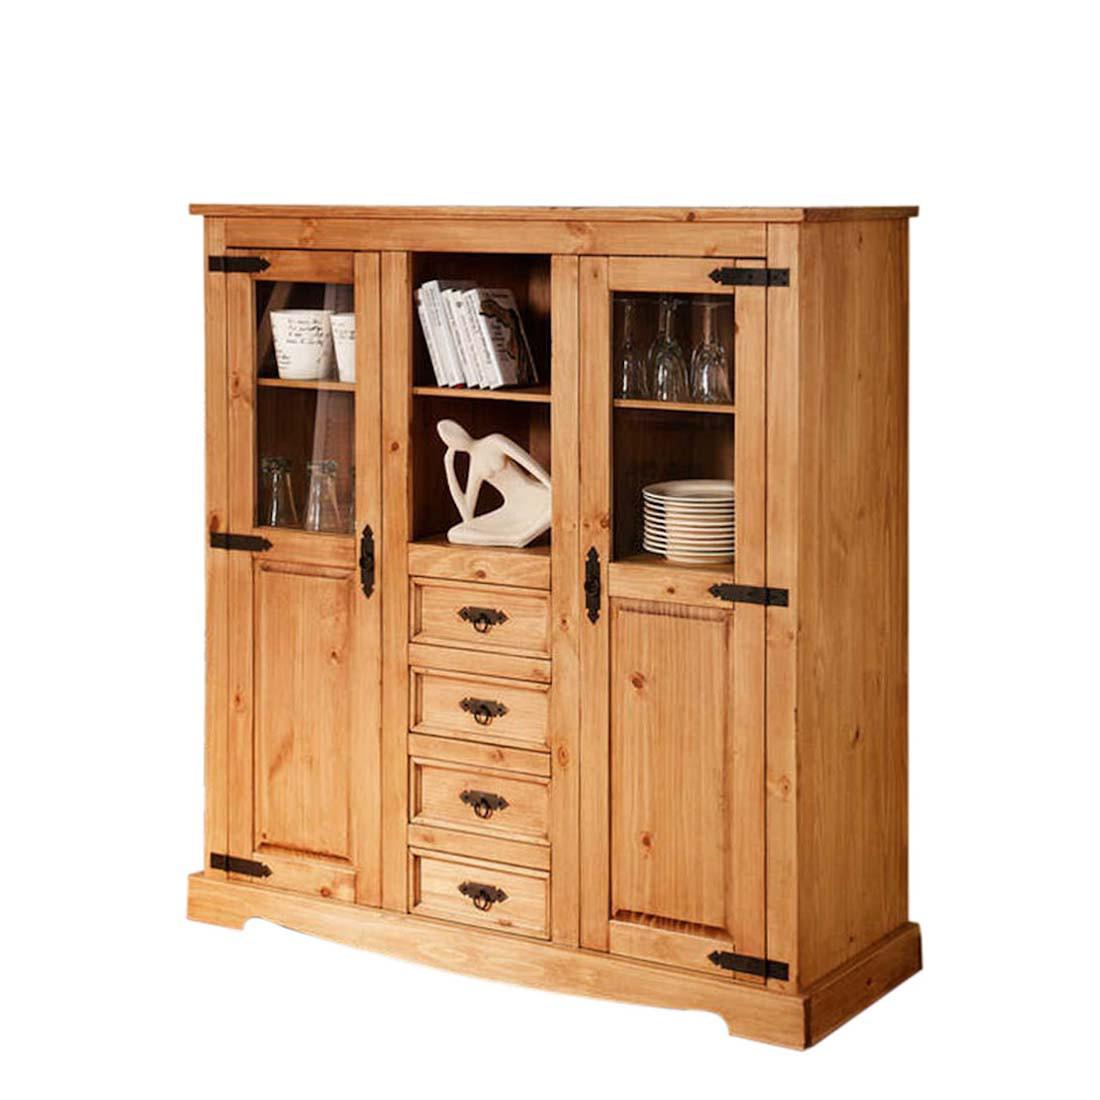 highboard zacateca kiefer massiv antik. Black Bedroom Furniture Sets. Home Design Ideas